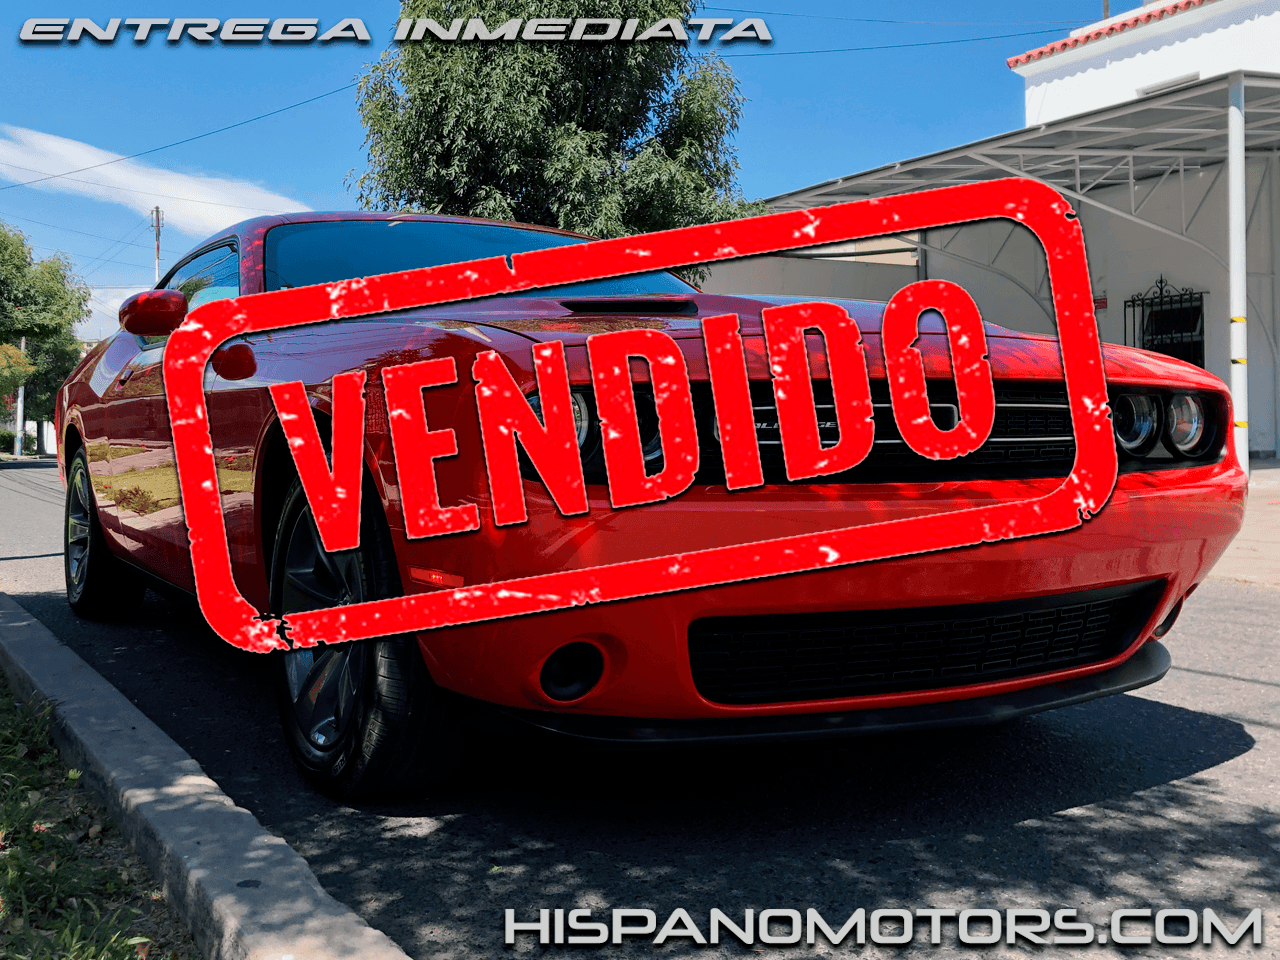 2019 DODGE CHALLENGER V6 - Arequipa - Perú - auto importado por Hispanomotors